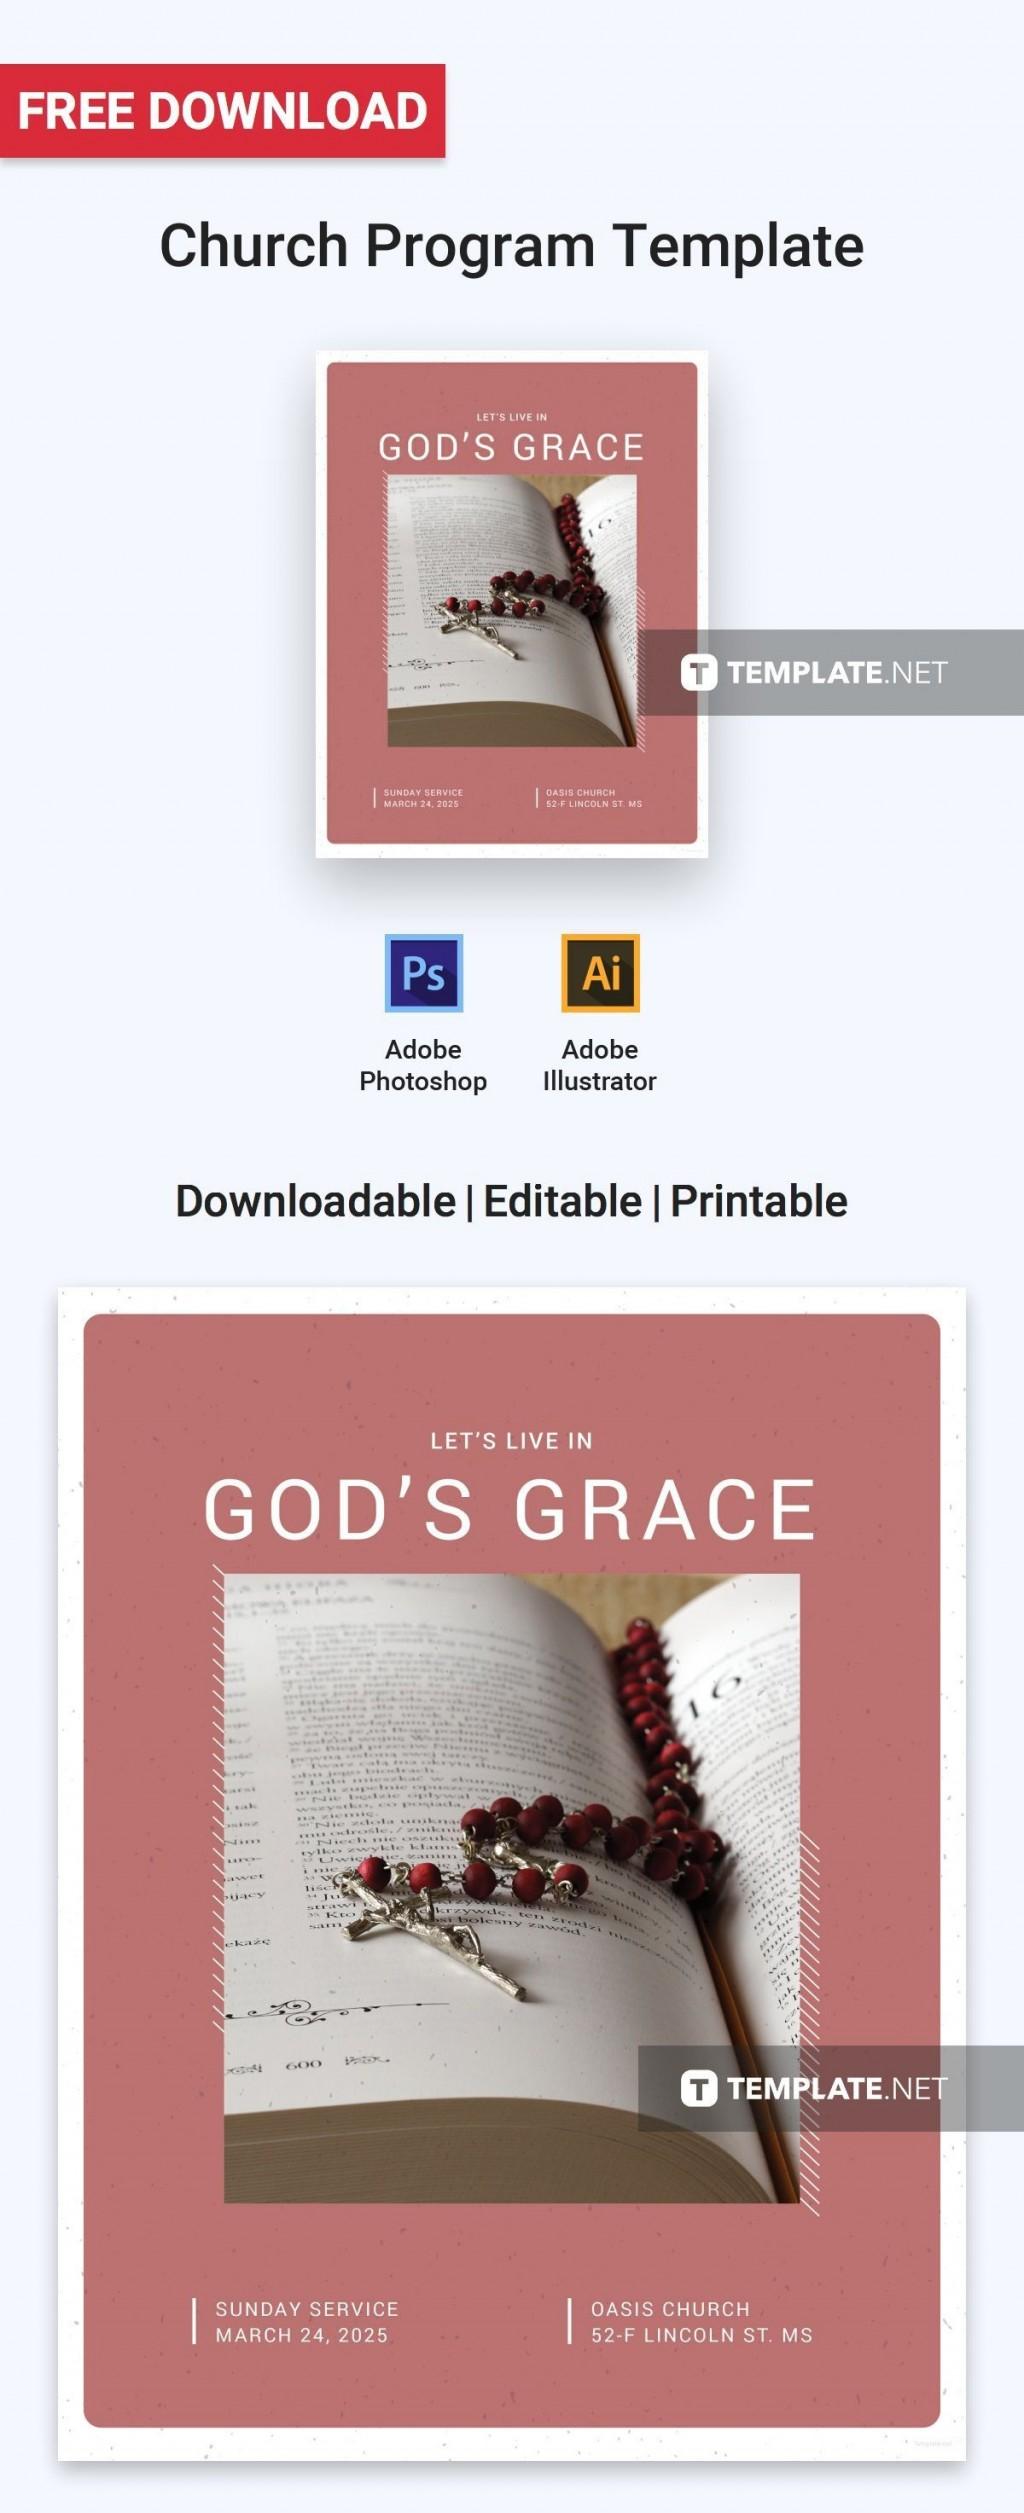 001 Fantastic Free Church Program Template Microsoft Publisher Highest Quality Large